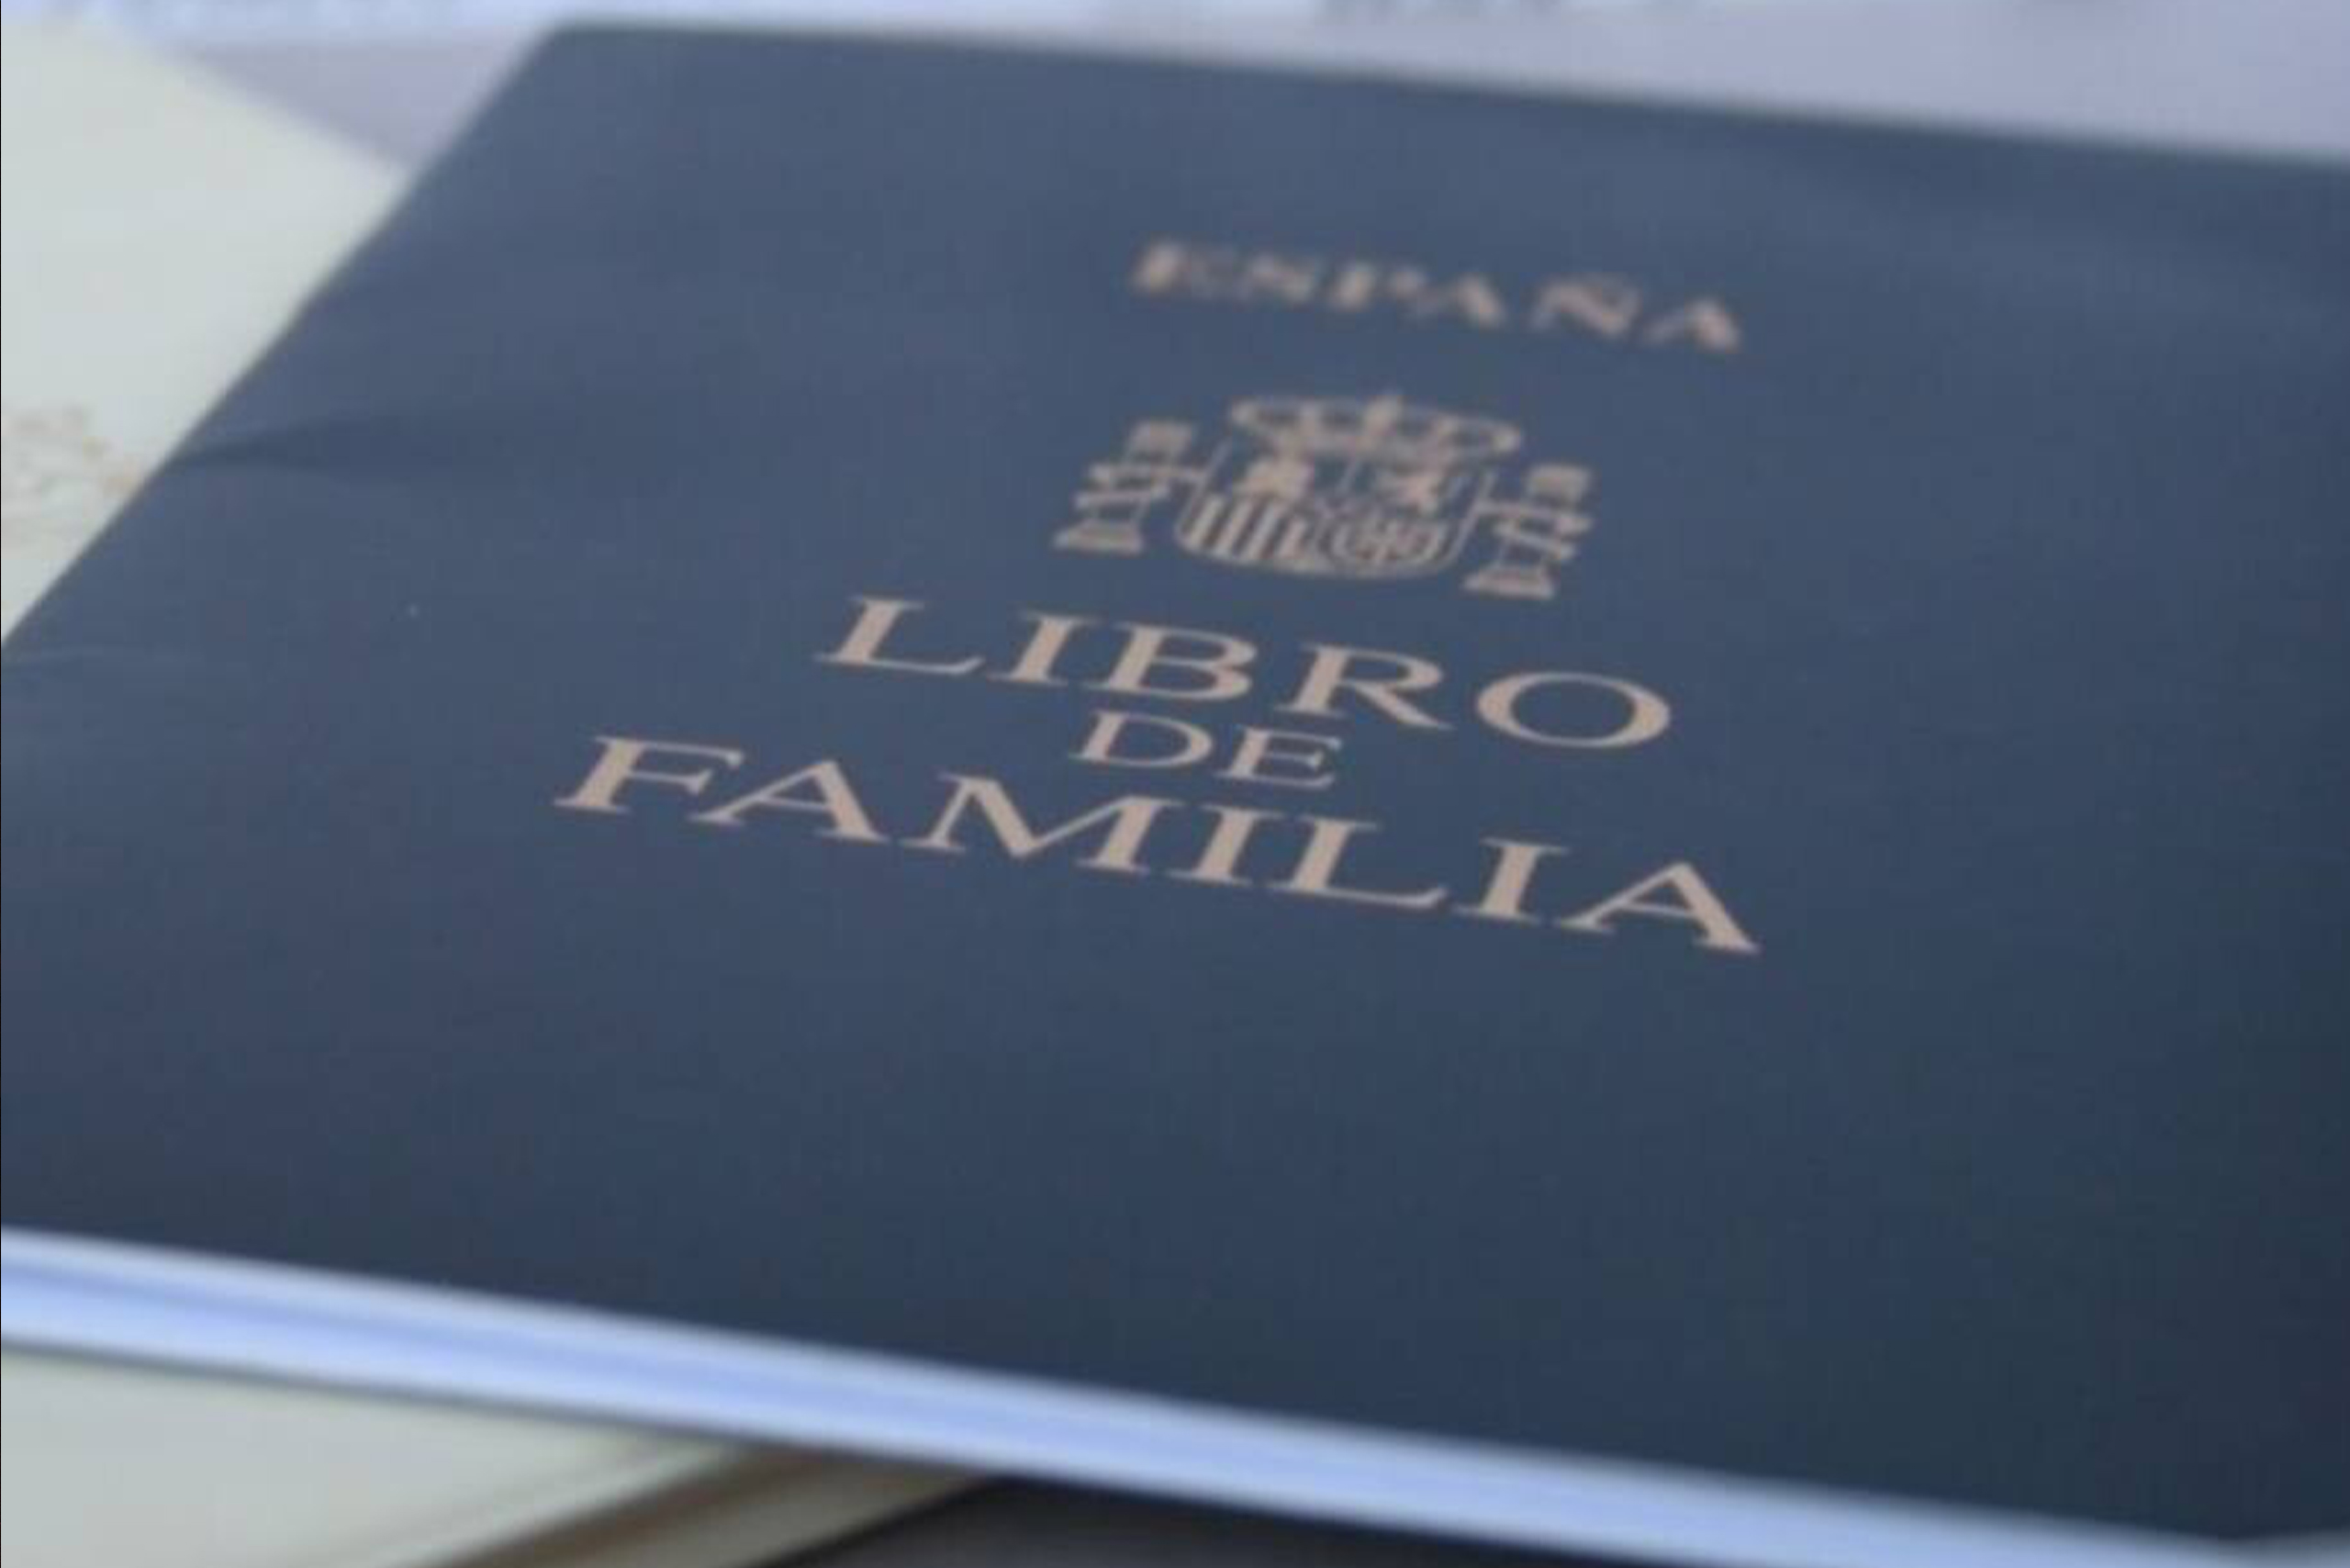 fin-libro-de-familia